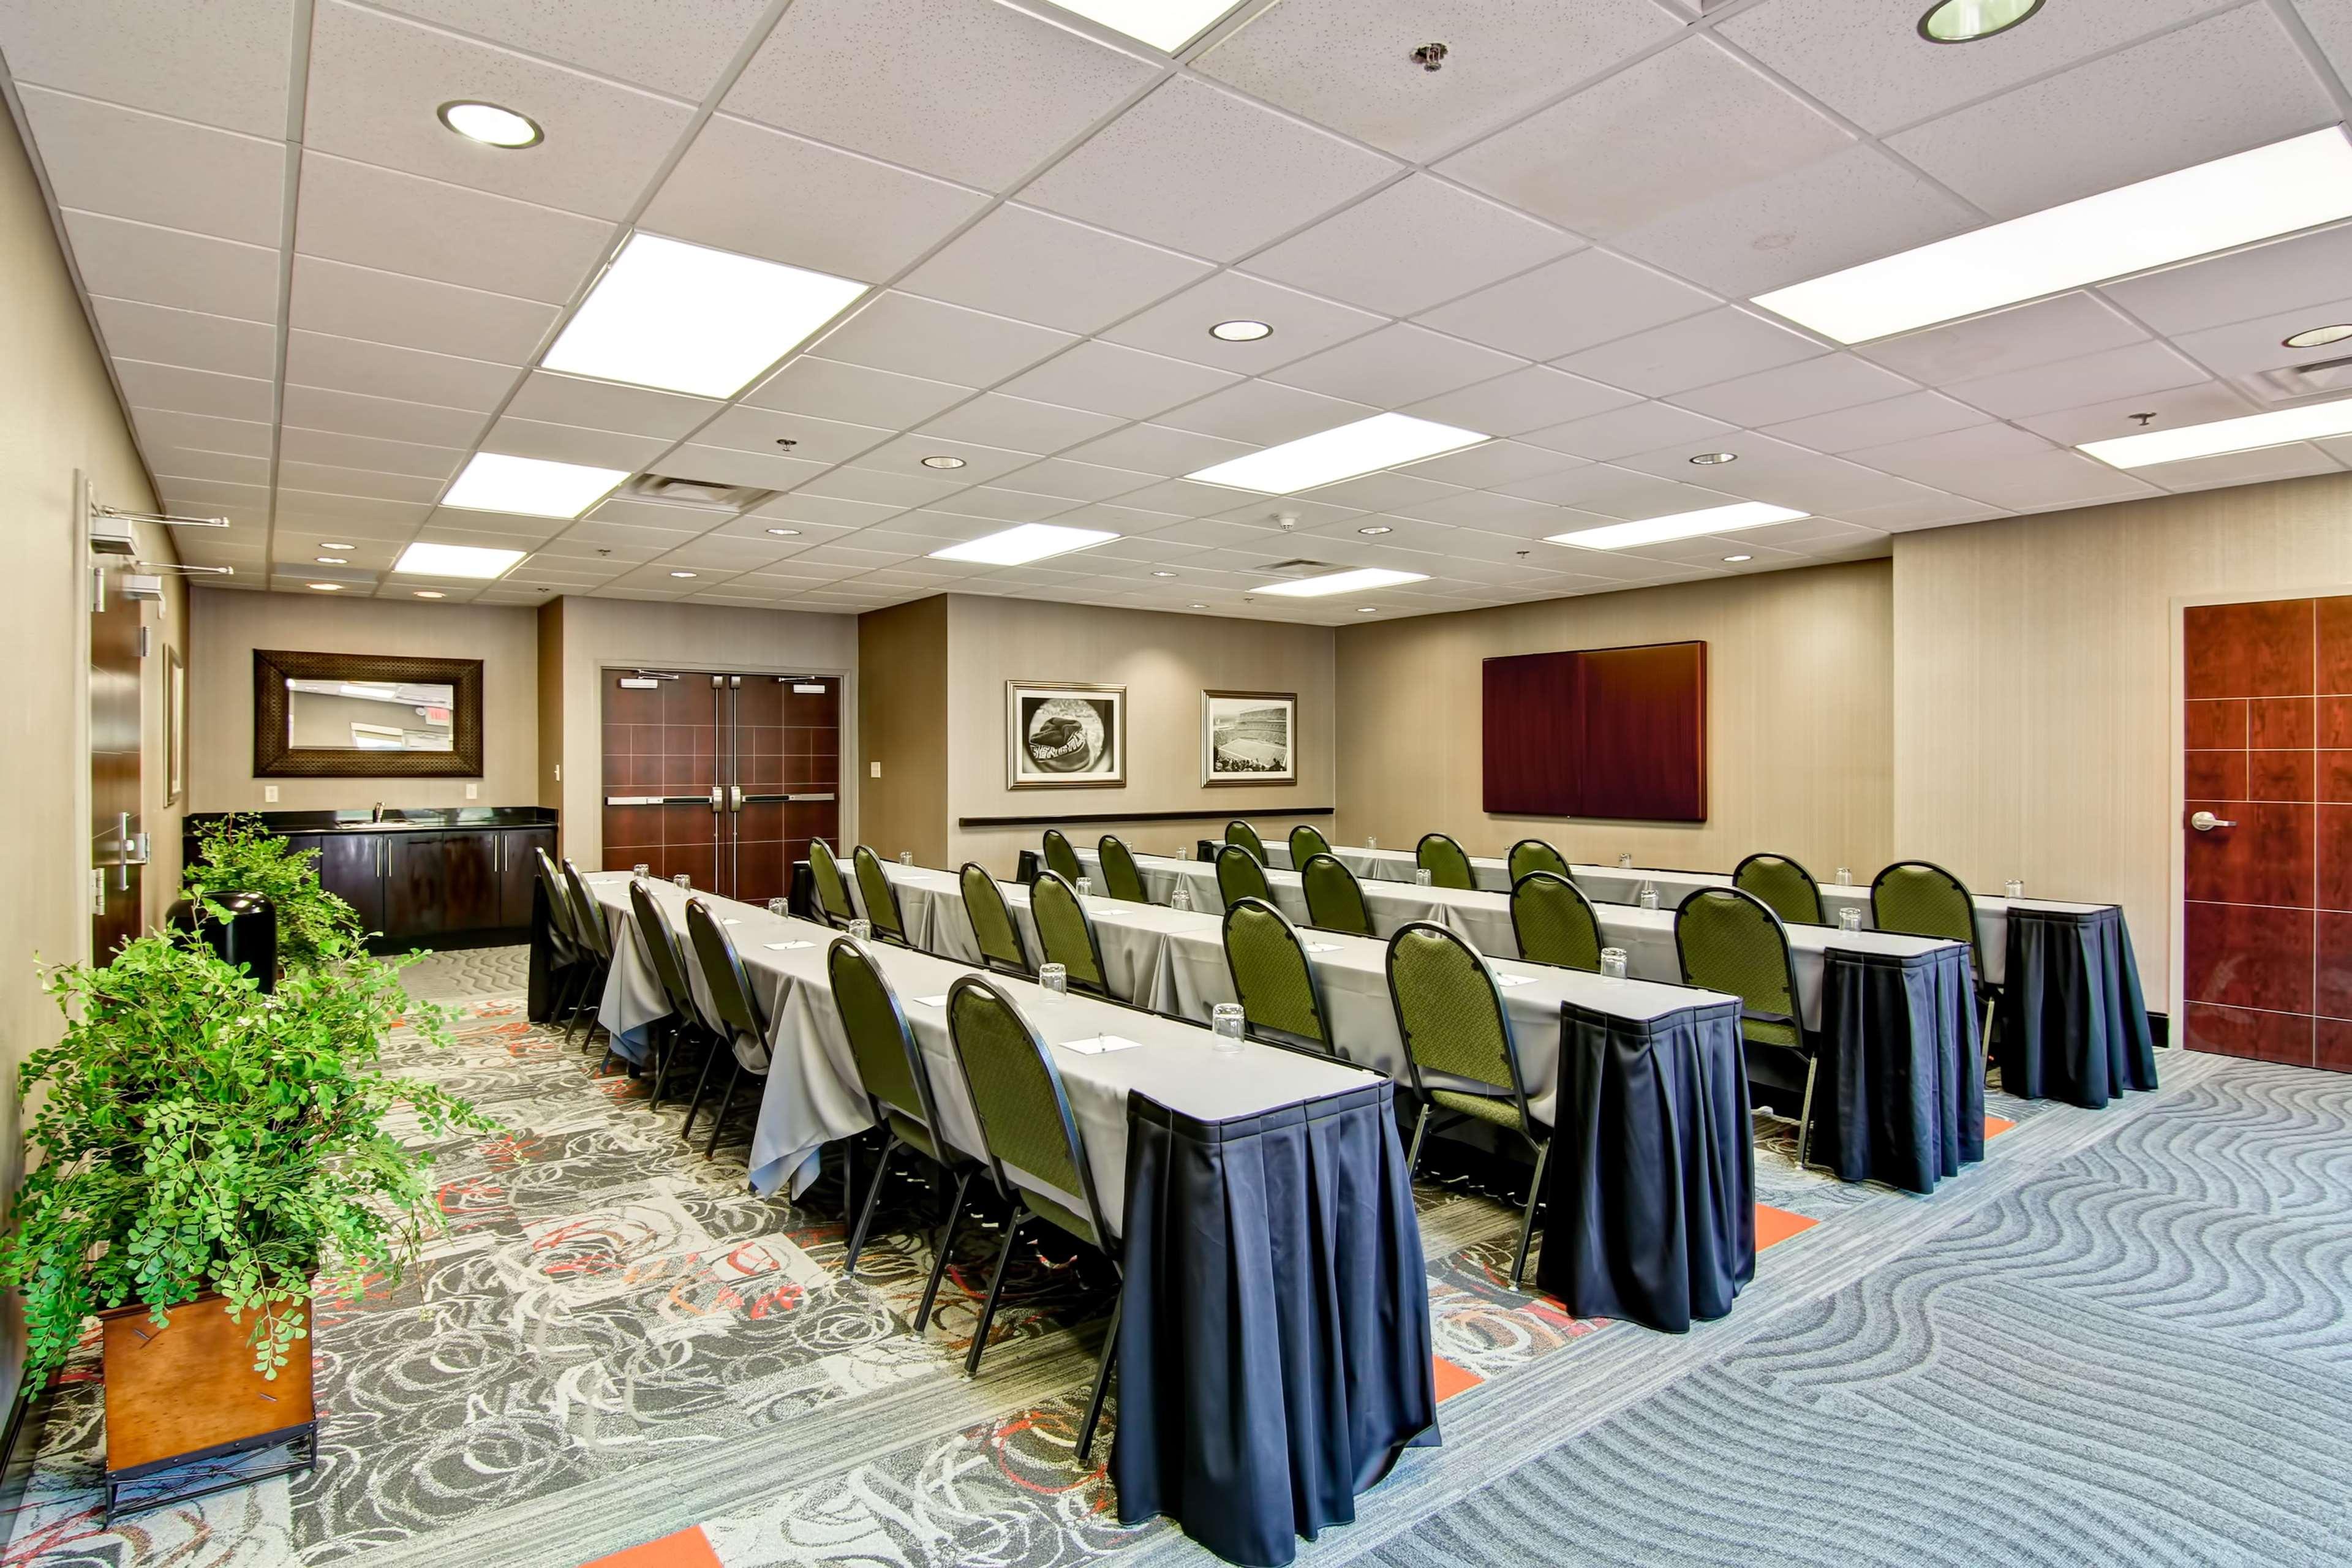 Homewood Suites by Hilton Cincinnati Airport South-Florence image 37